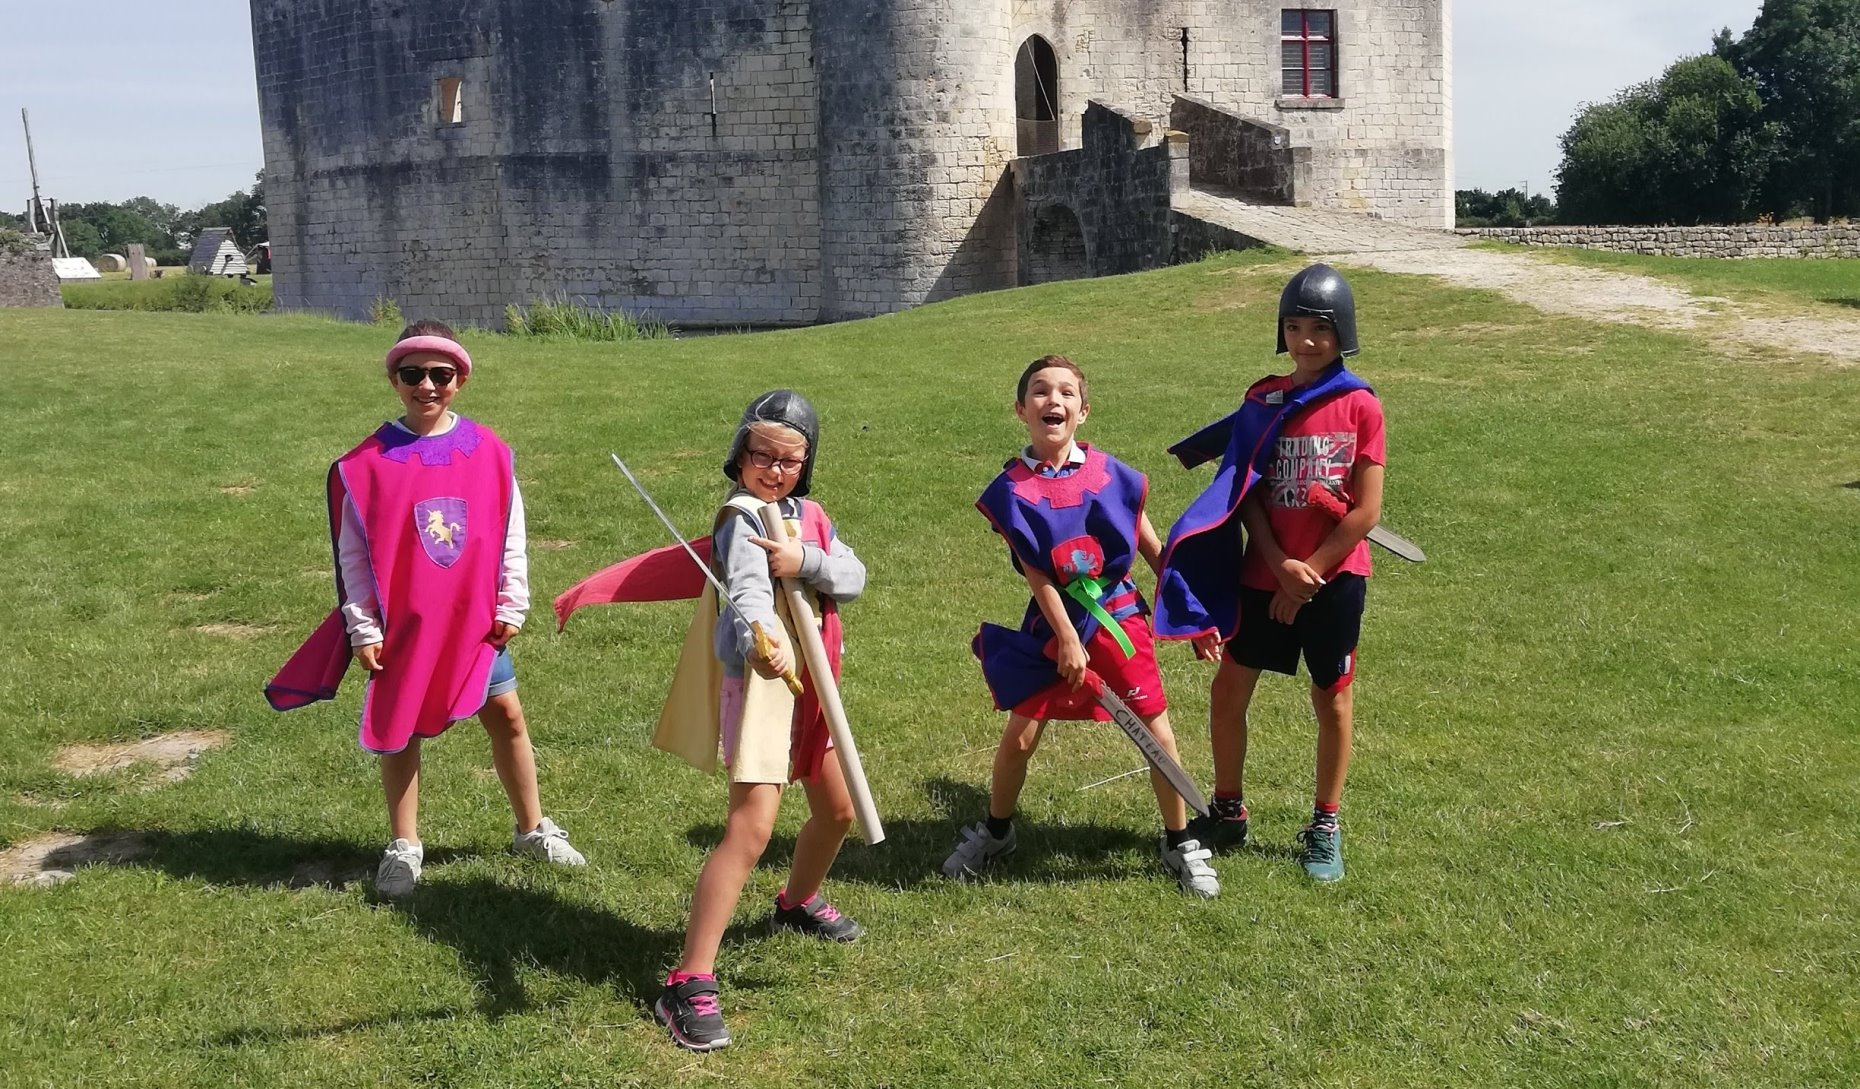 château de Saint-Jean d'Angle